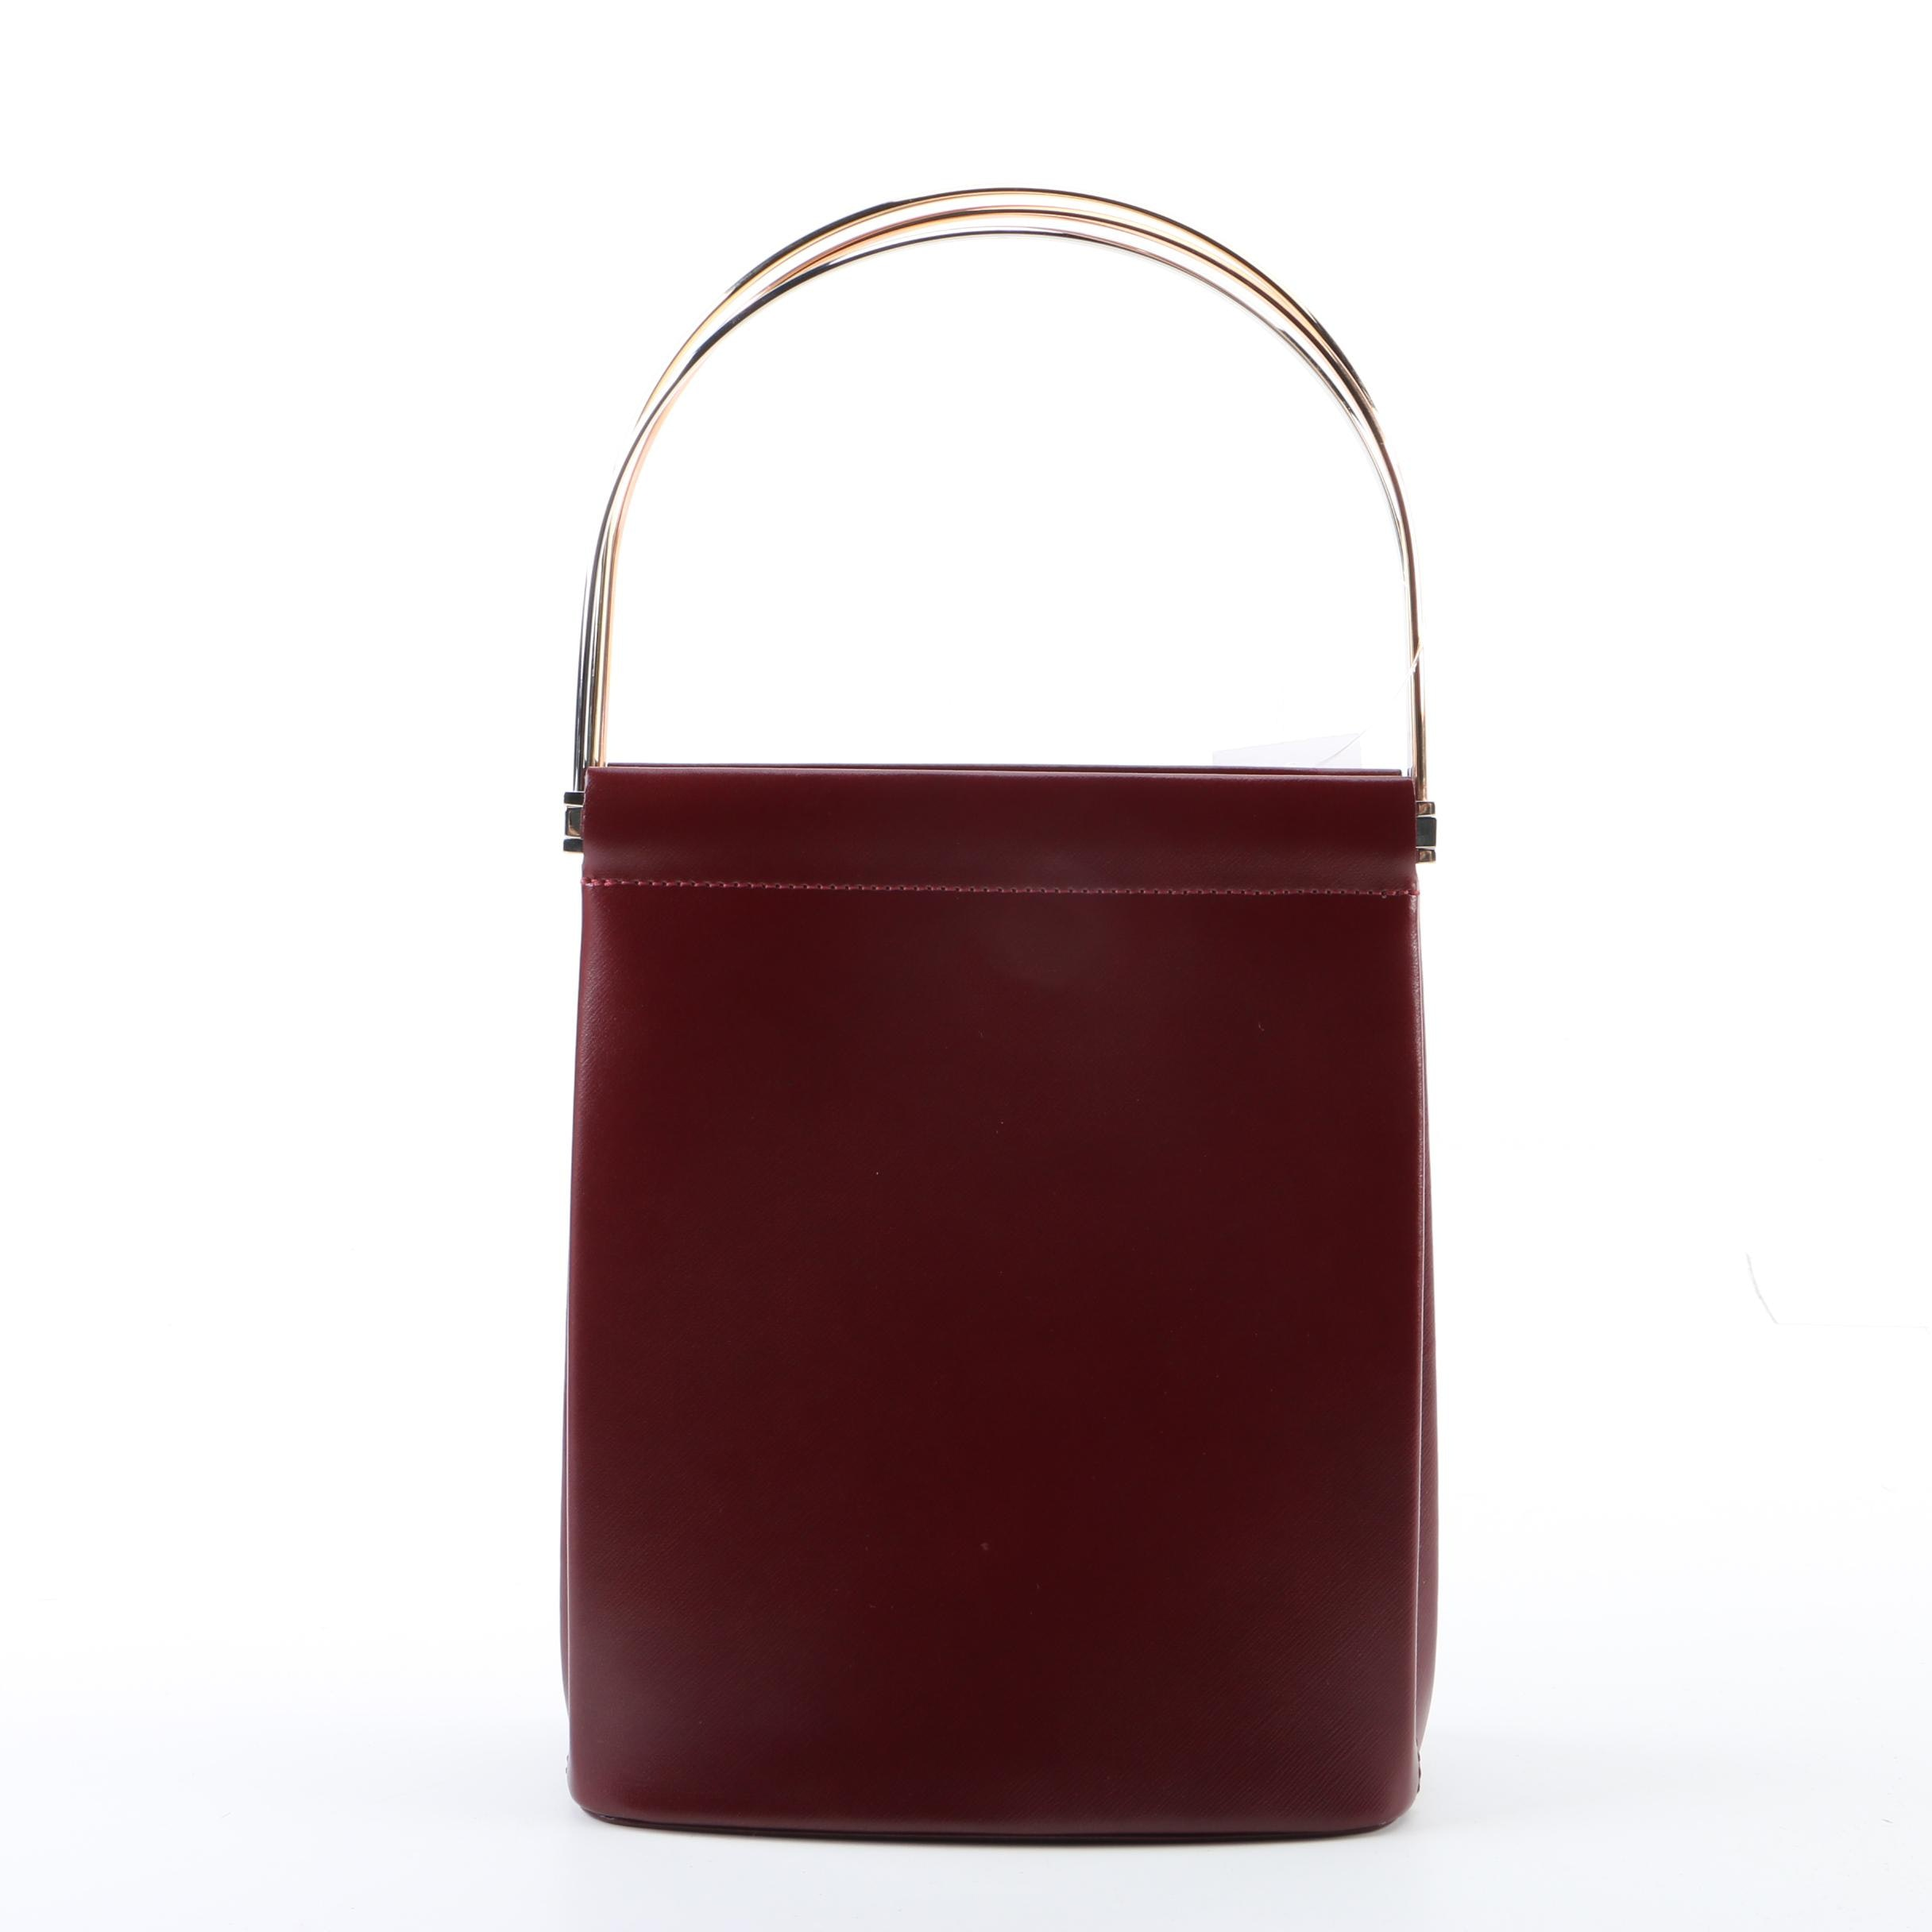 Cartier Oxblood Red Leather Trinity Handbag